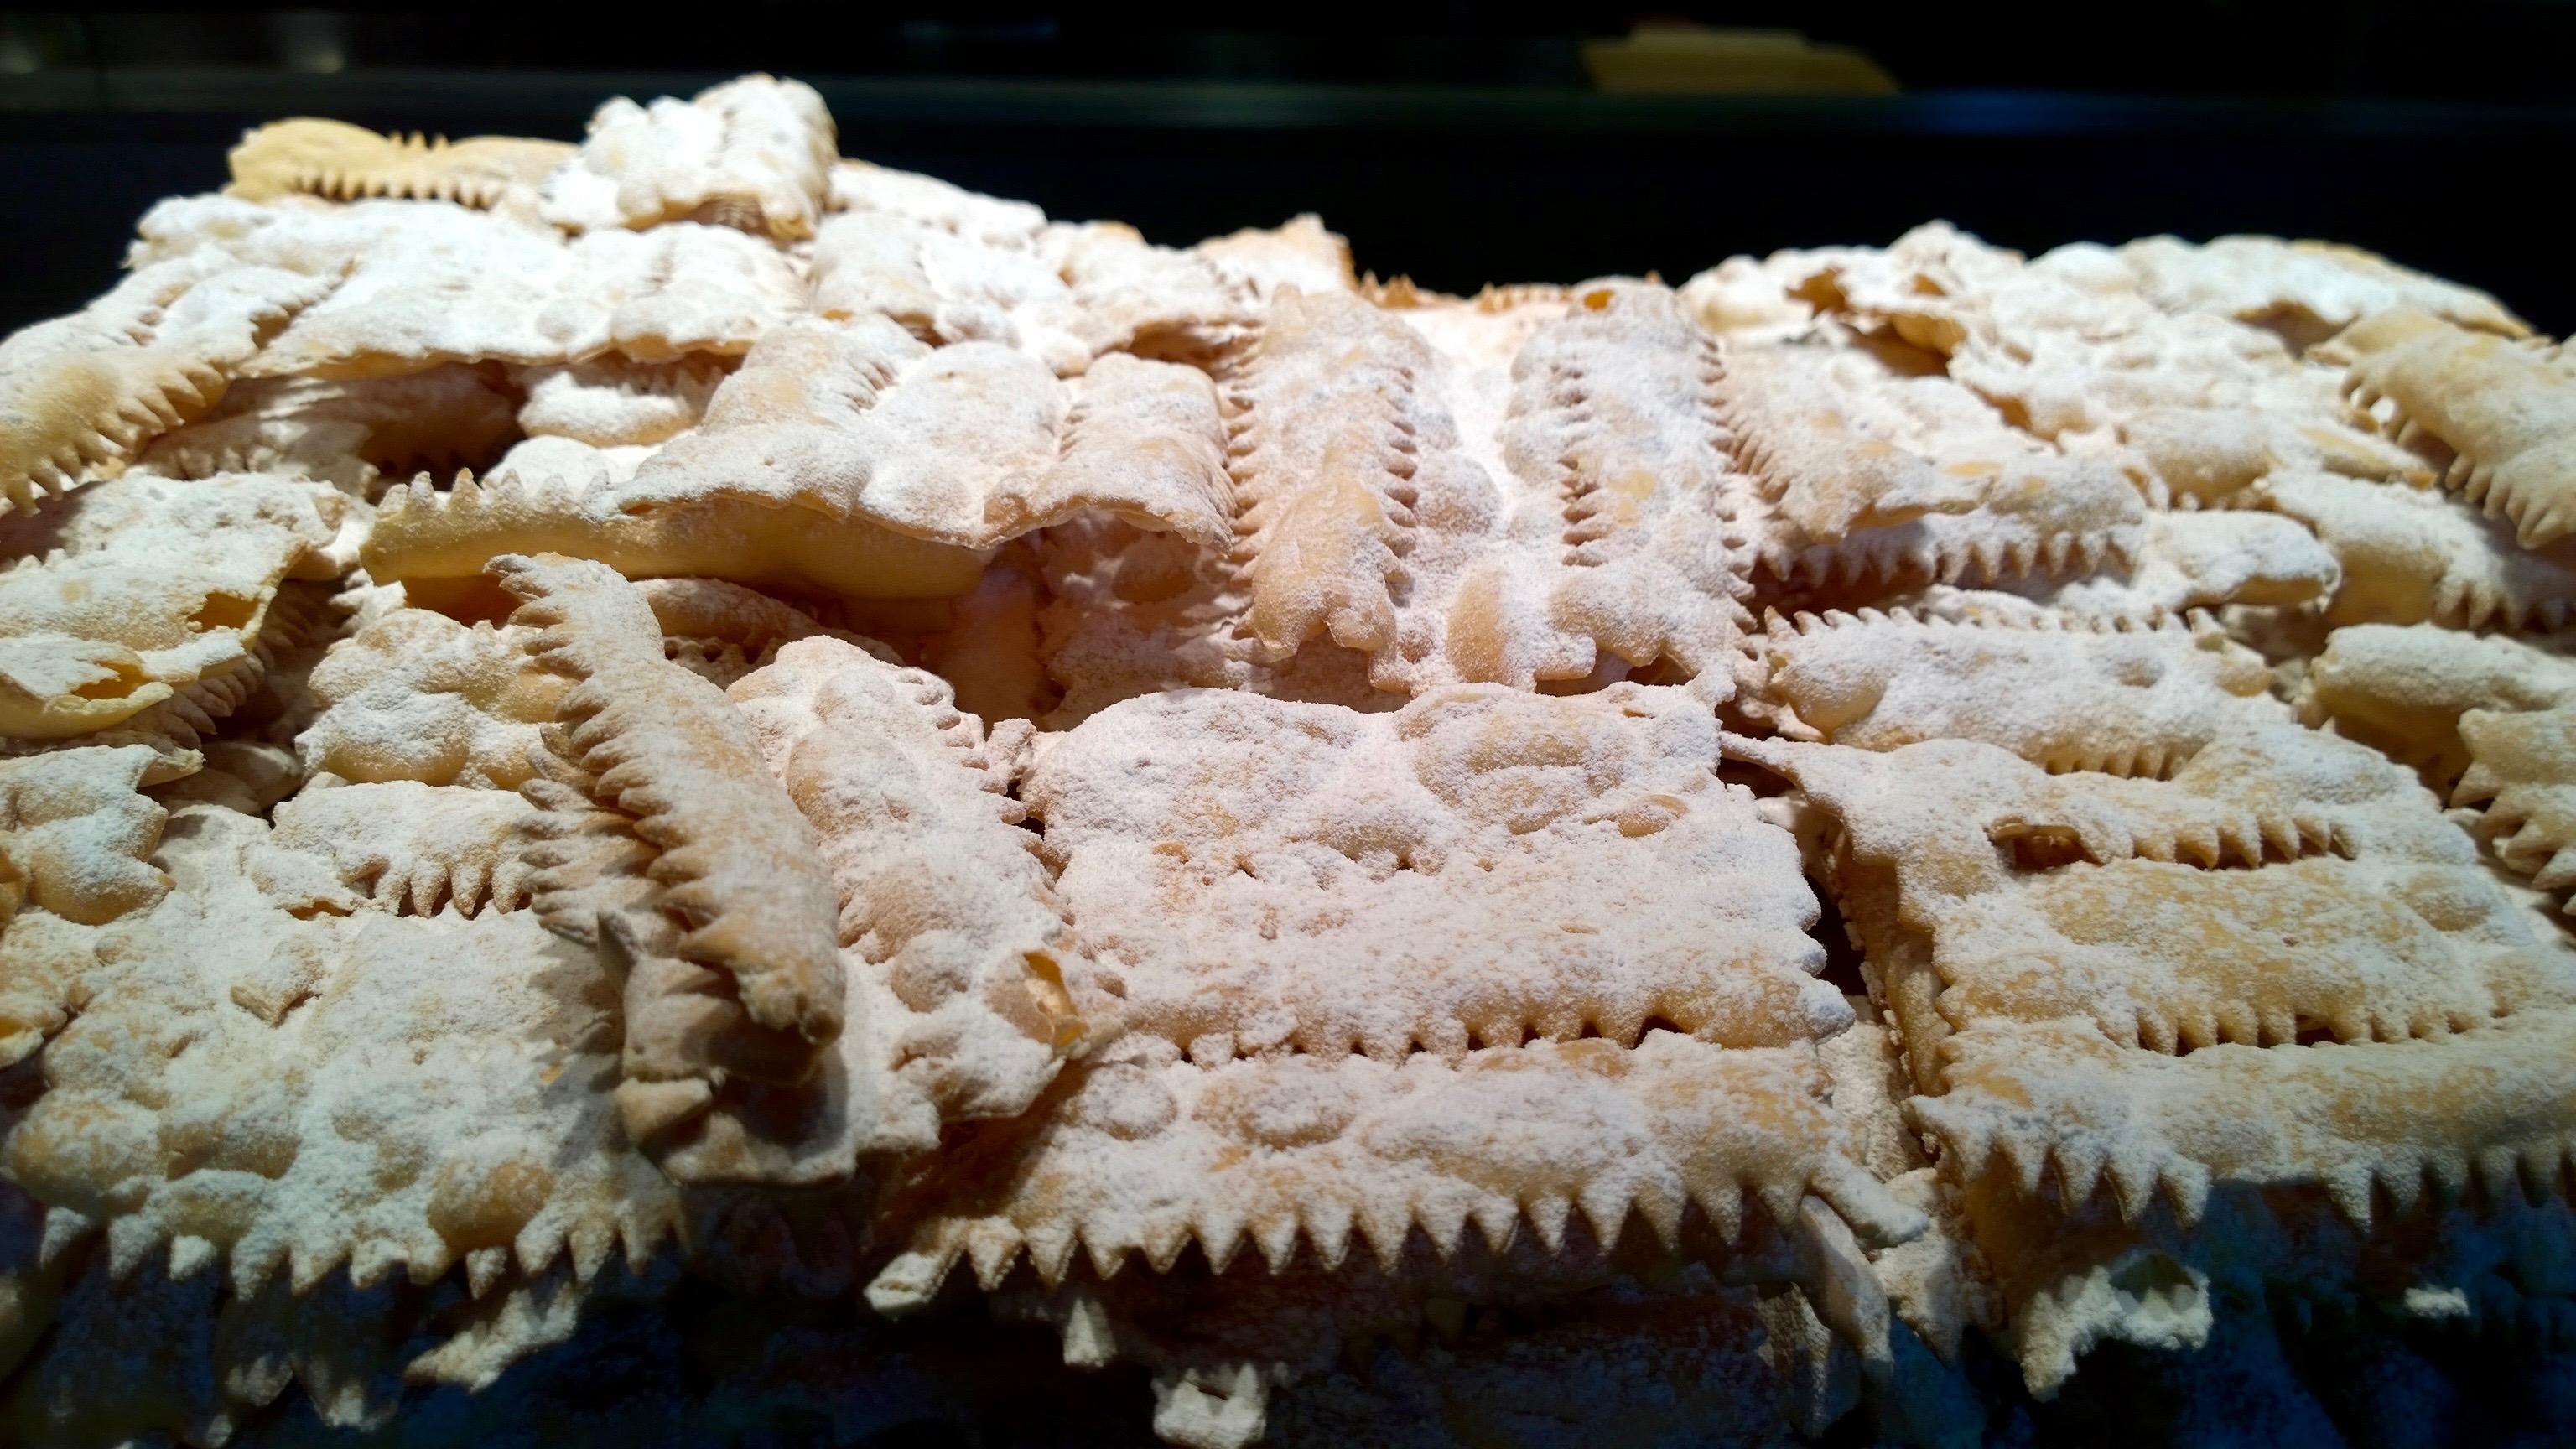 Gastronomia italiana doces típicos do carnaval chiacchiere